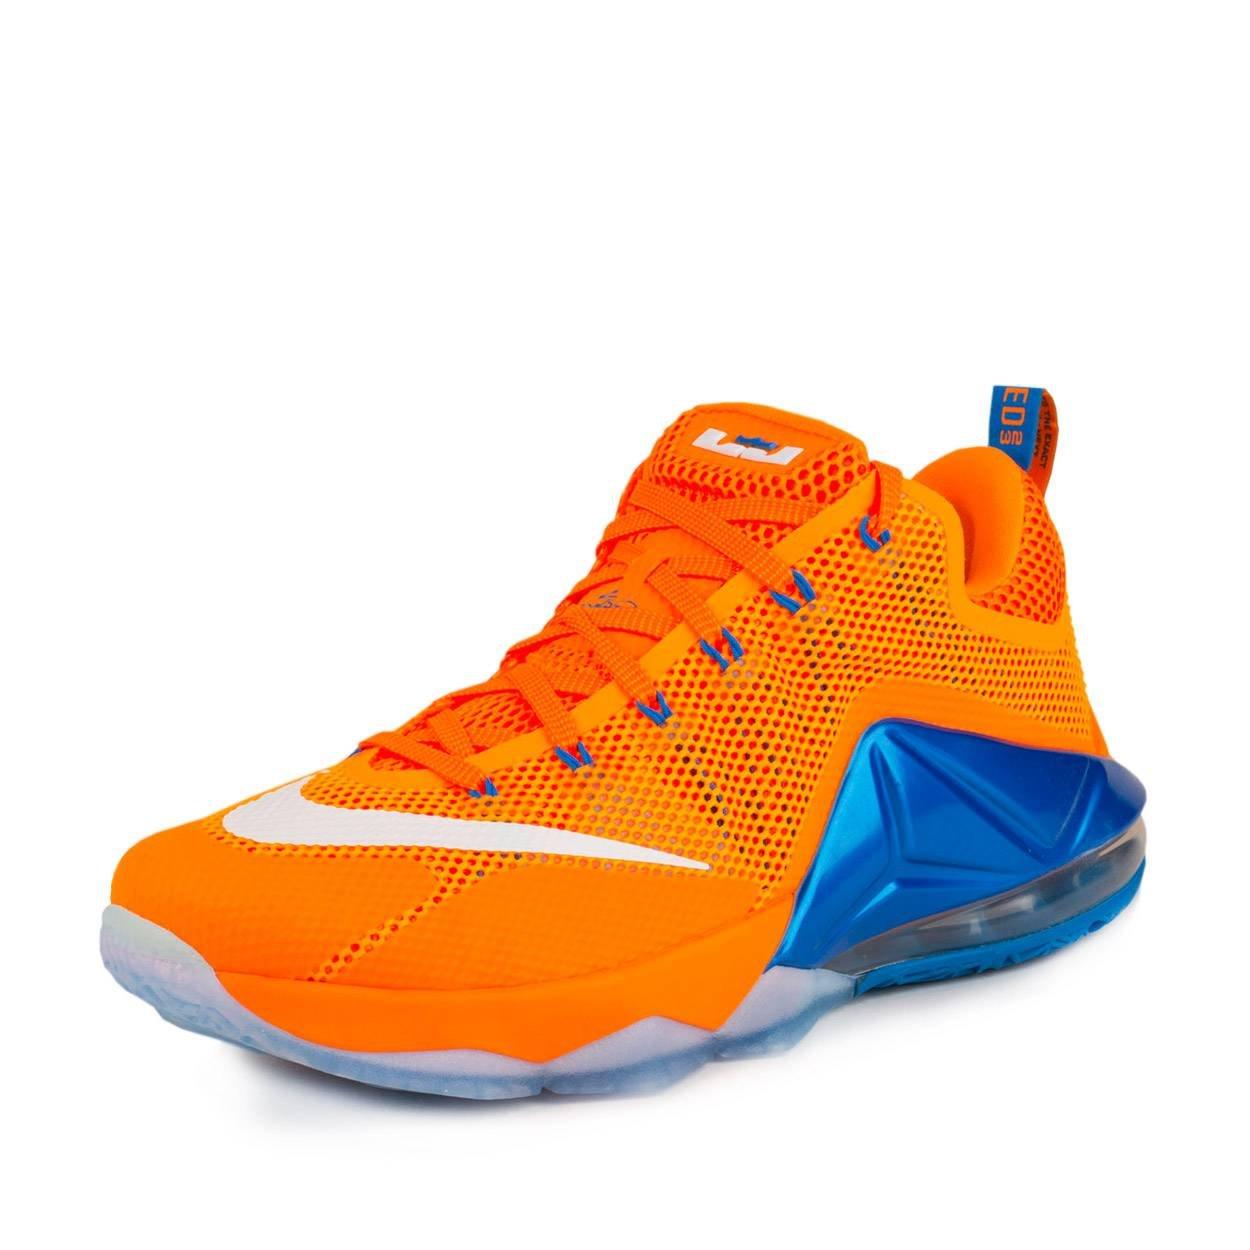 sale retailer 83b18 3626a Galleon - NIKE Men s Lebron XII Low Basketball Shoe (8)